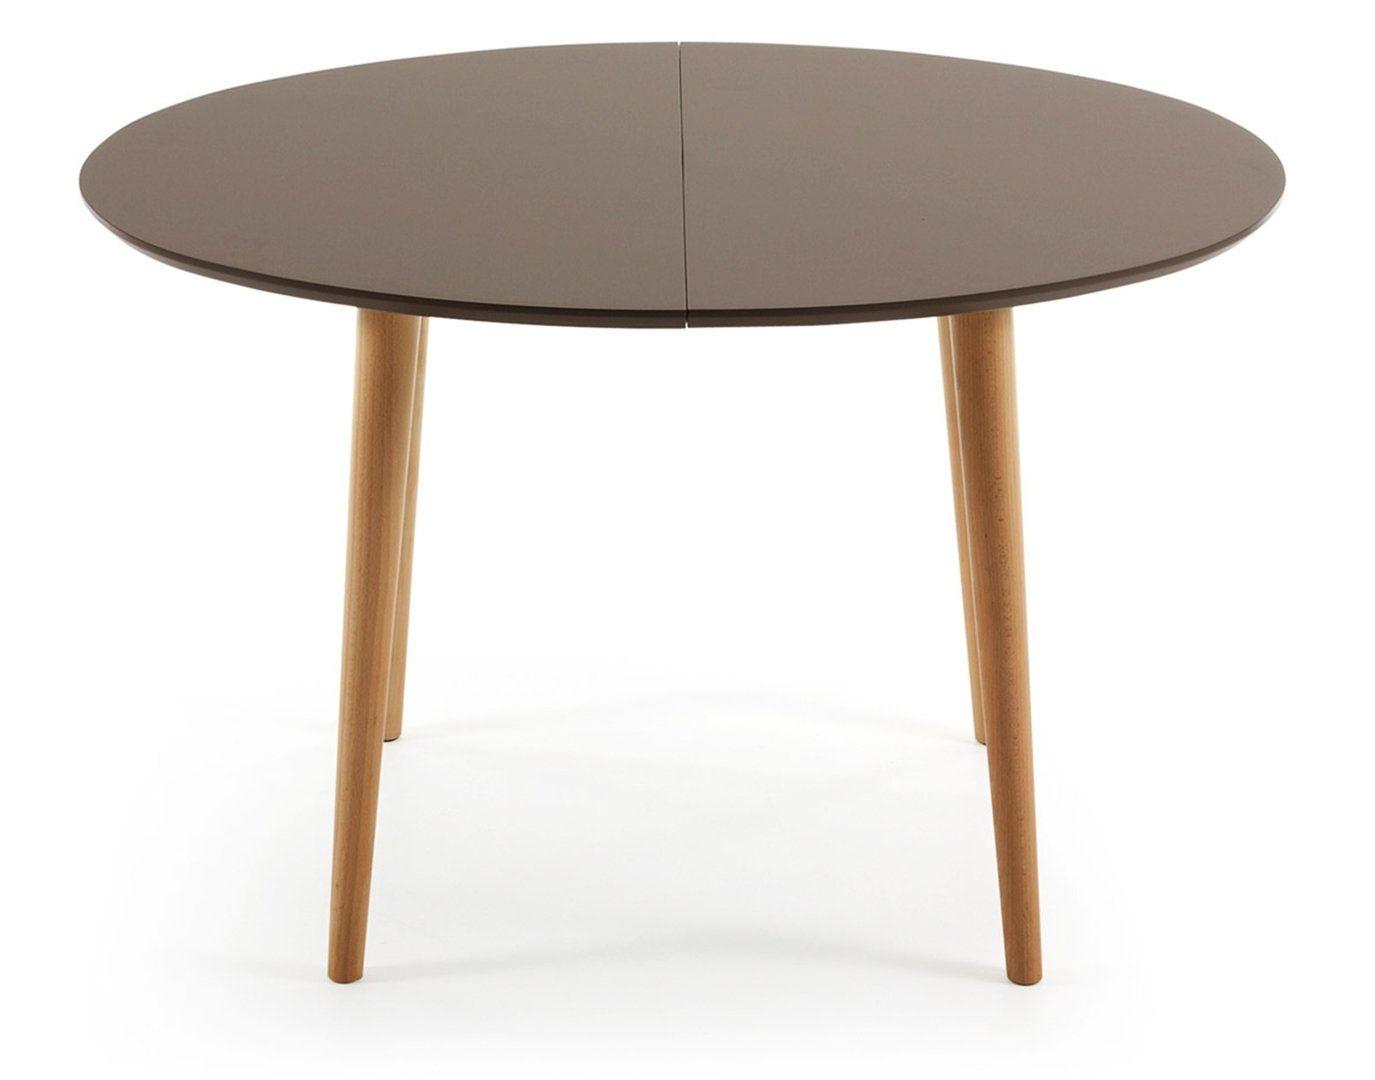 Mesa de comedor moderna oakland marron 120 cm - Decoracion mesa comedor ...